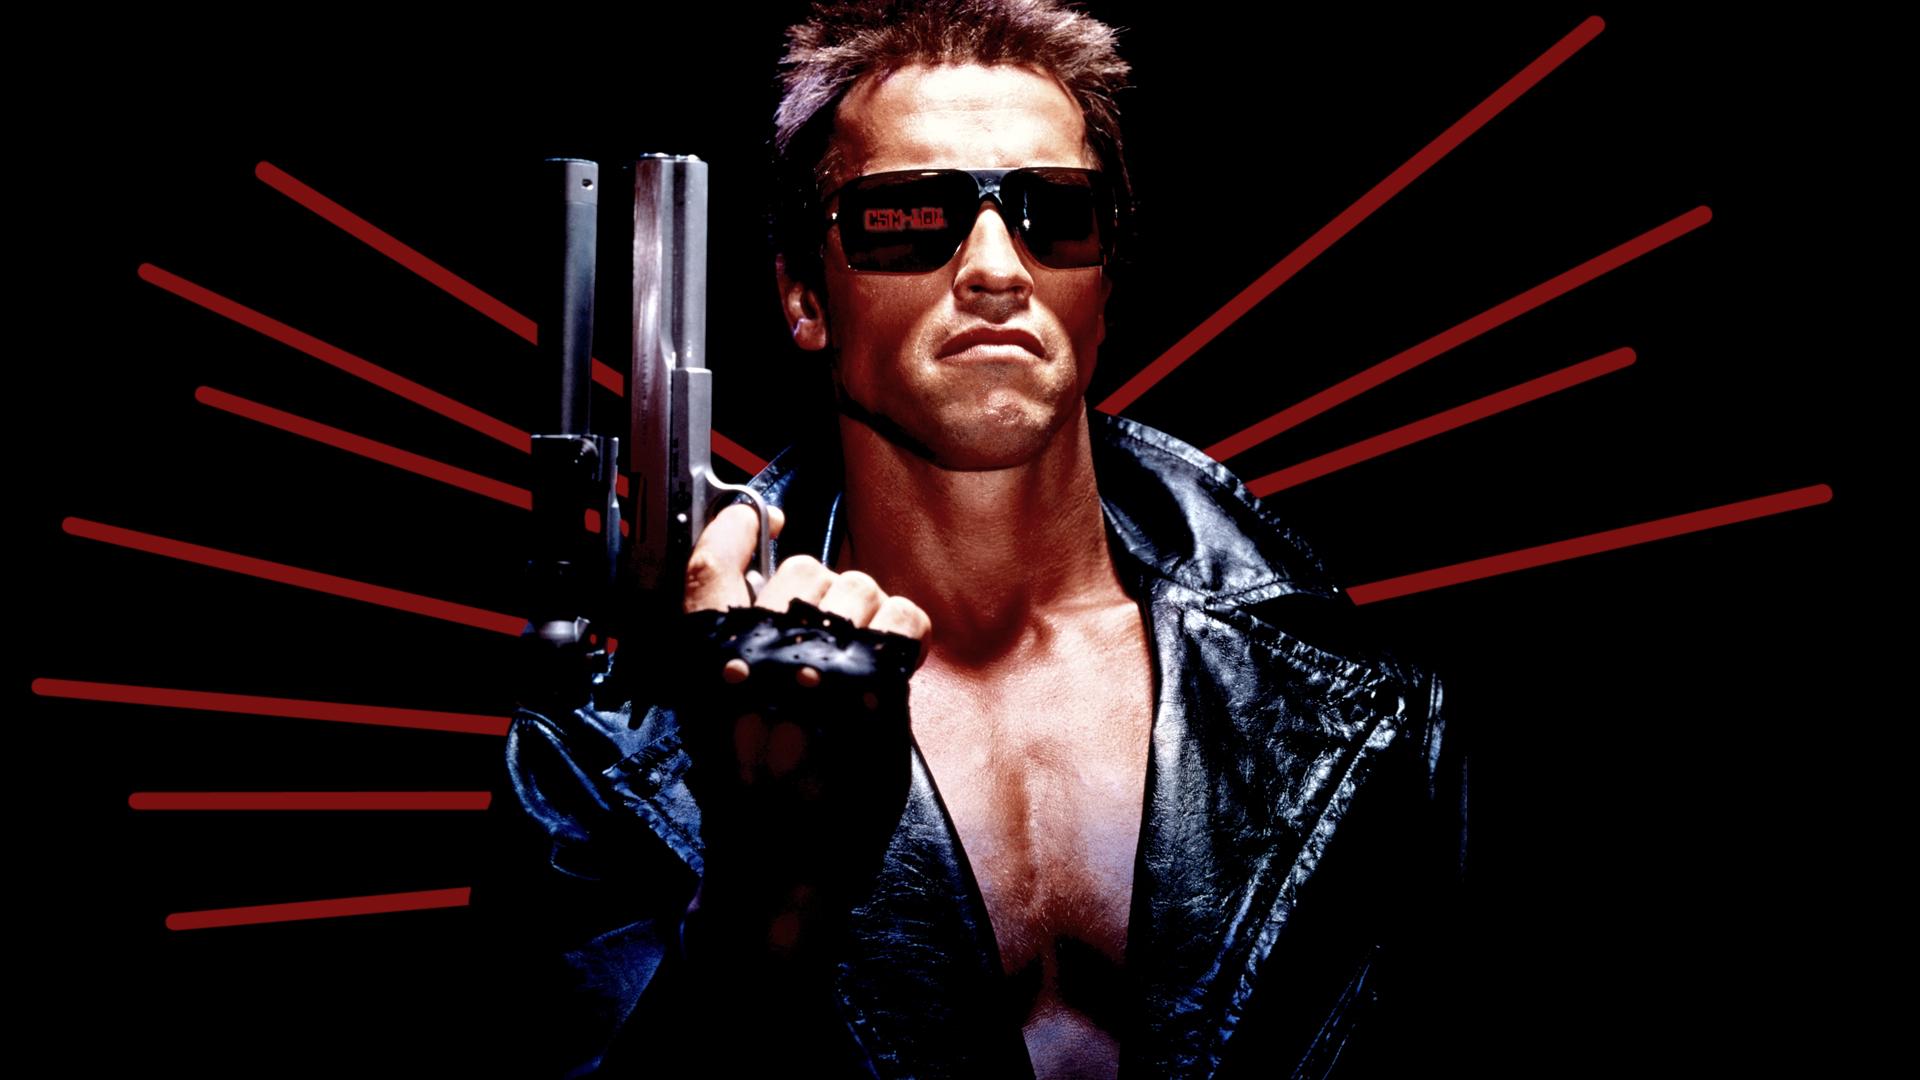 Movie Fanart: The Terminator